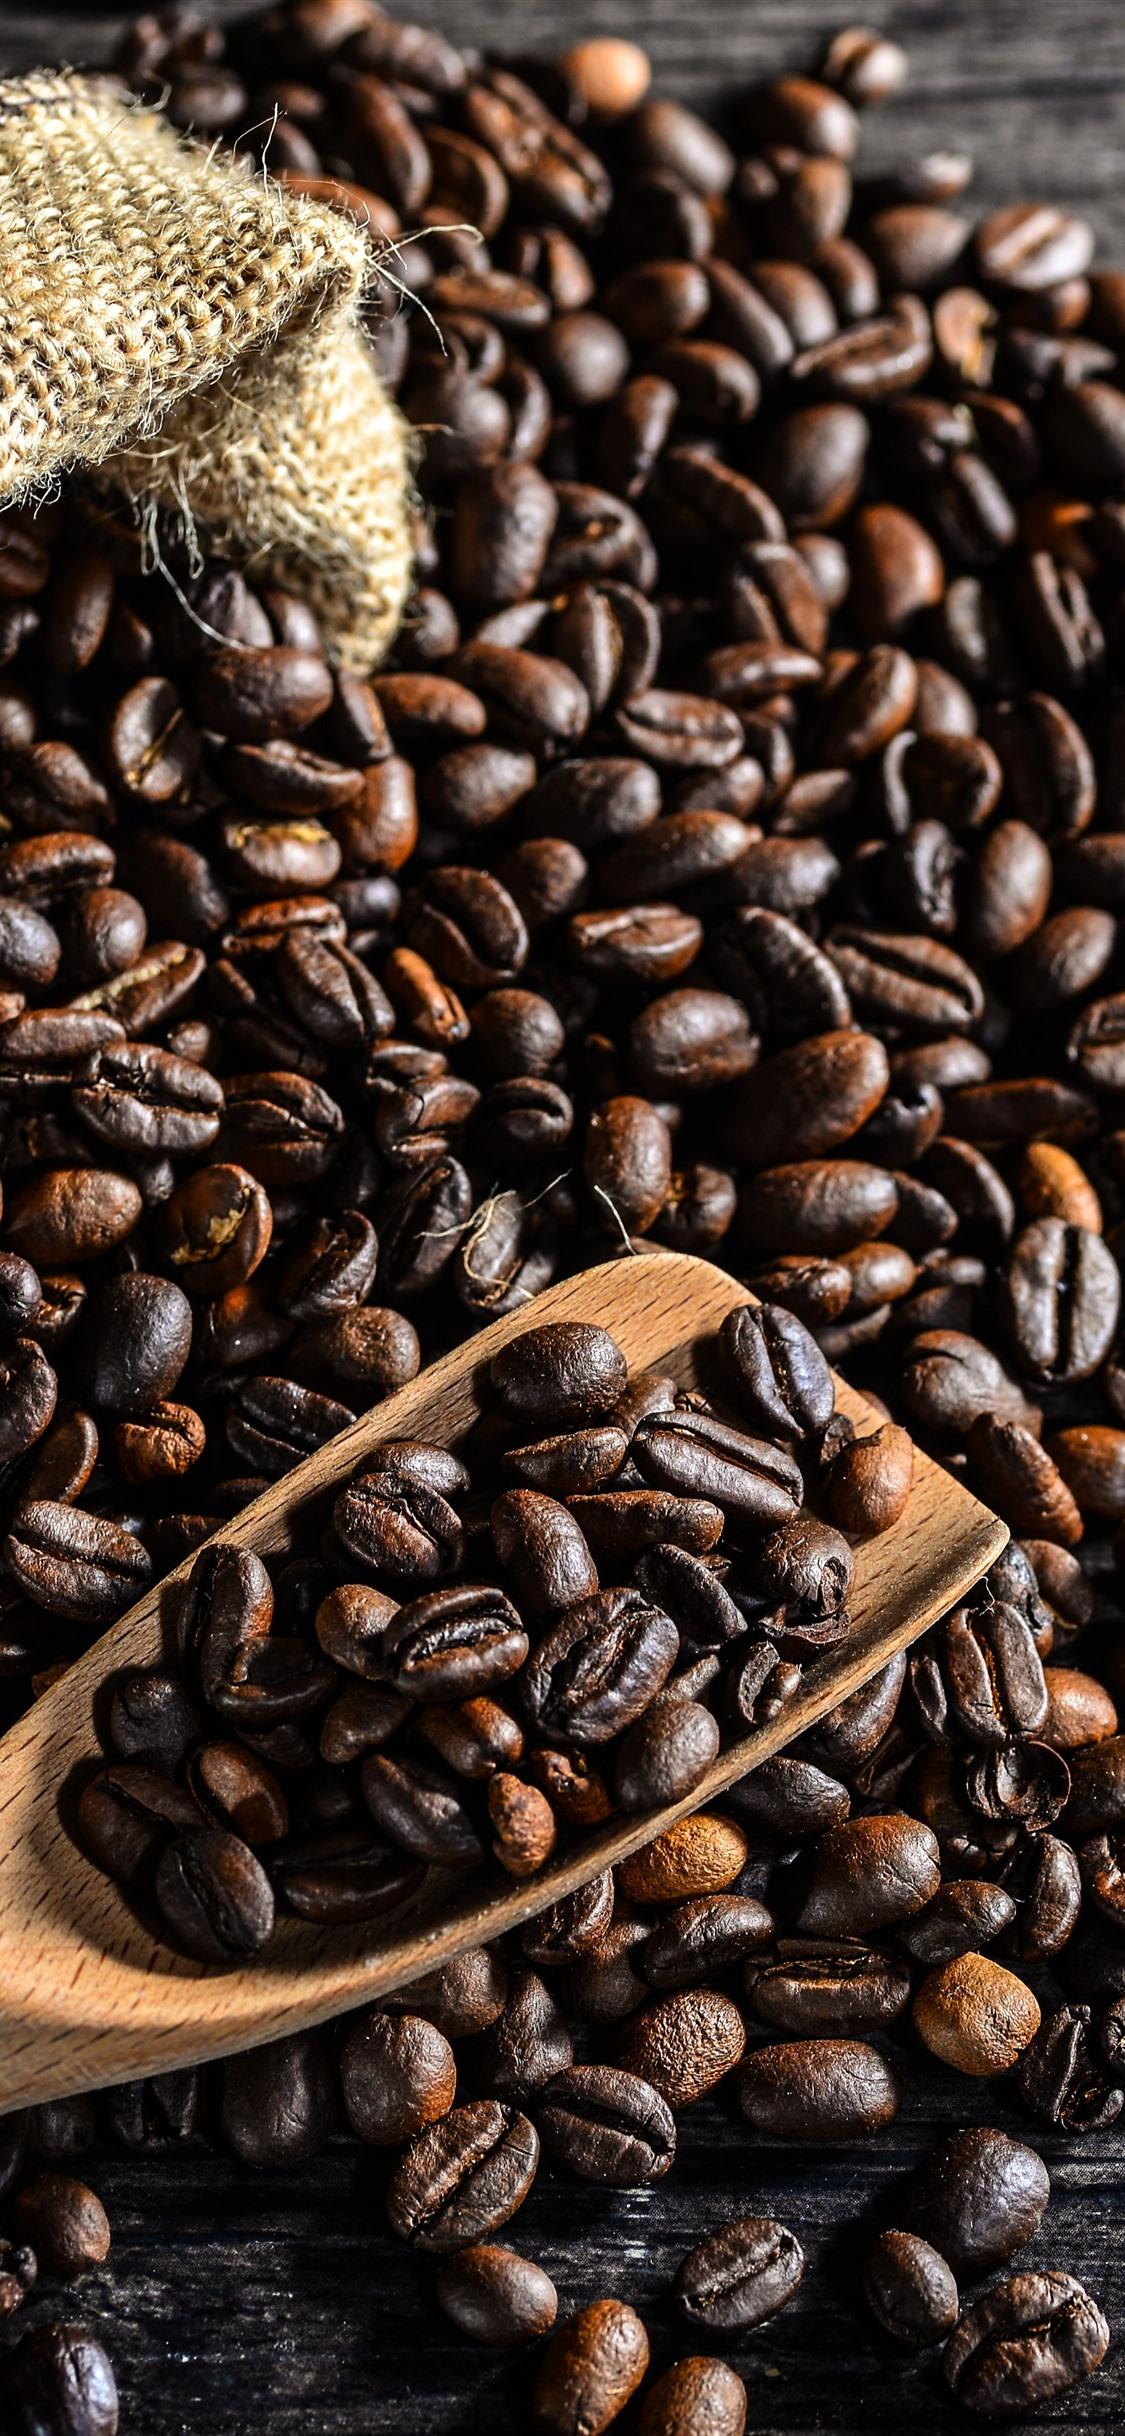 Coffee Beans Bag 1125x2436 Iphone Xs X Wallpaper